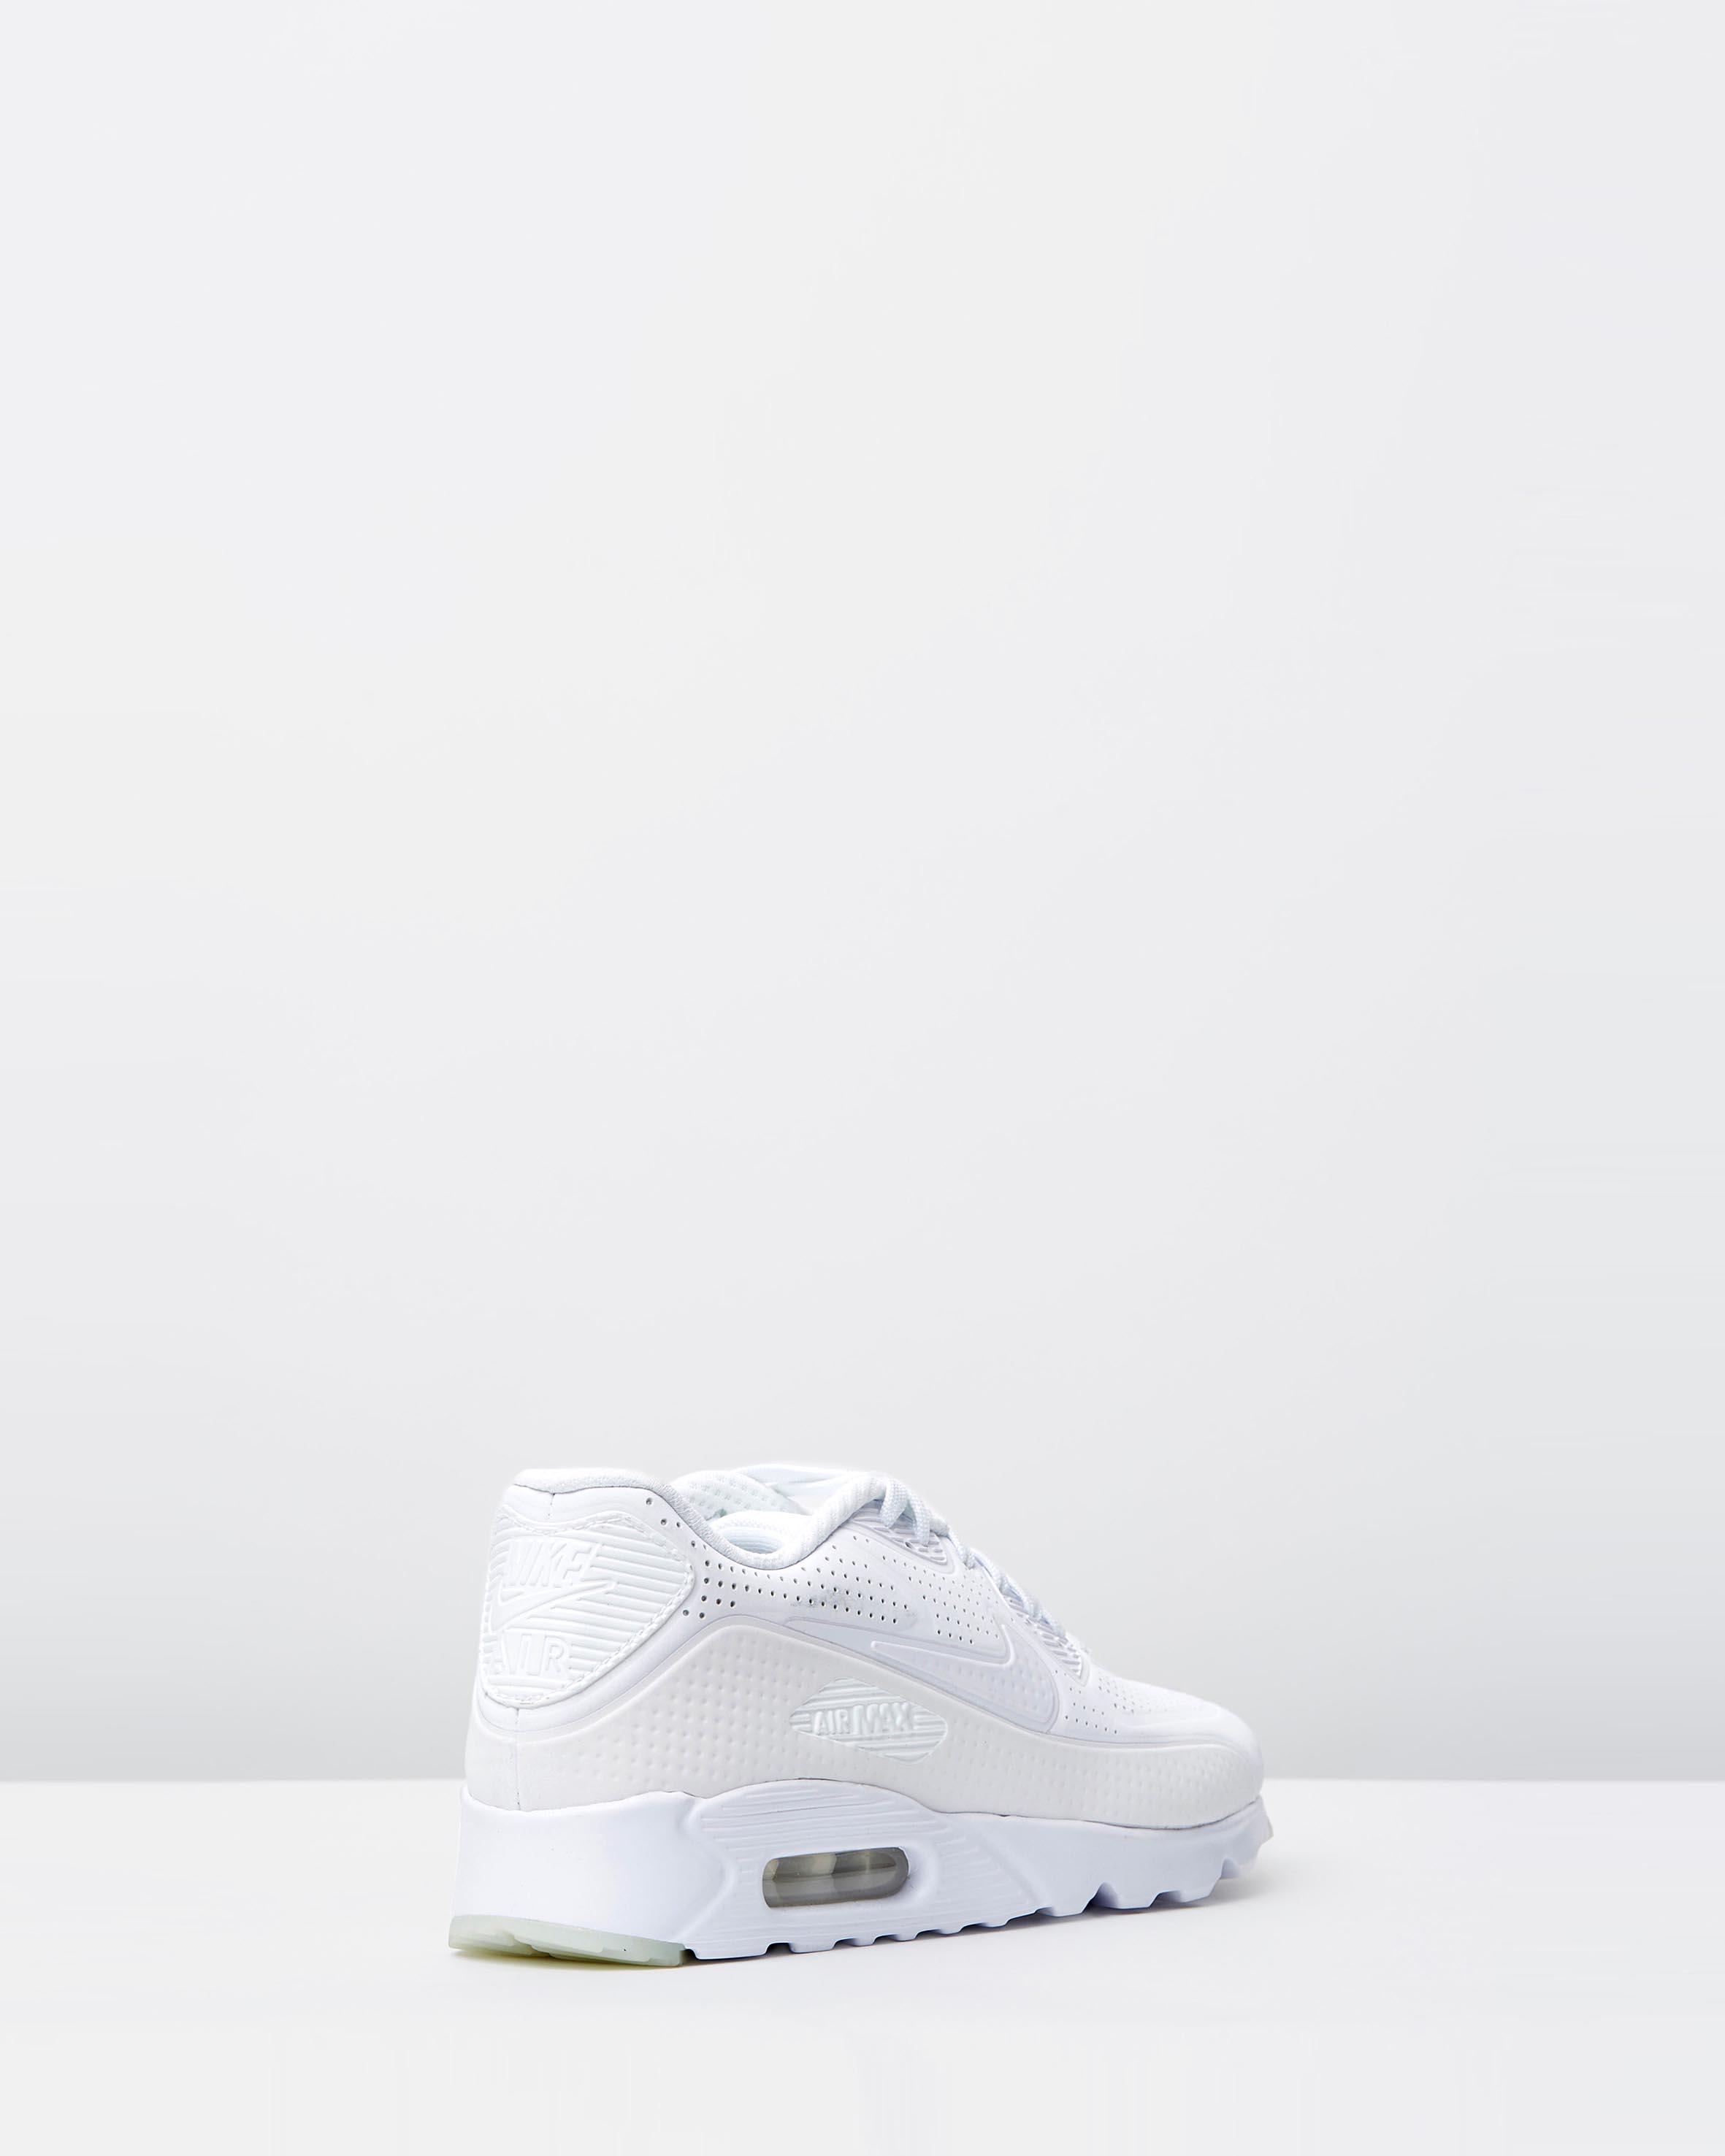 b8cb59bdc0 Nike Air Max 90 Ultra Moire White | Sneaker Store - 95Gallery.com